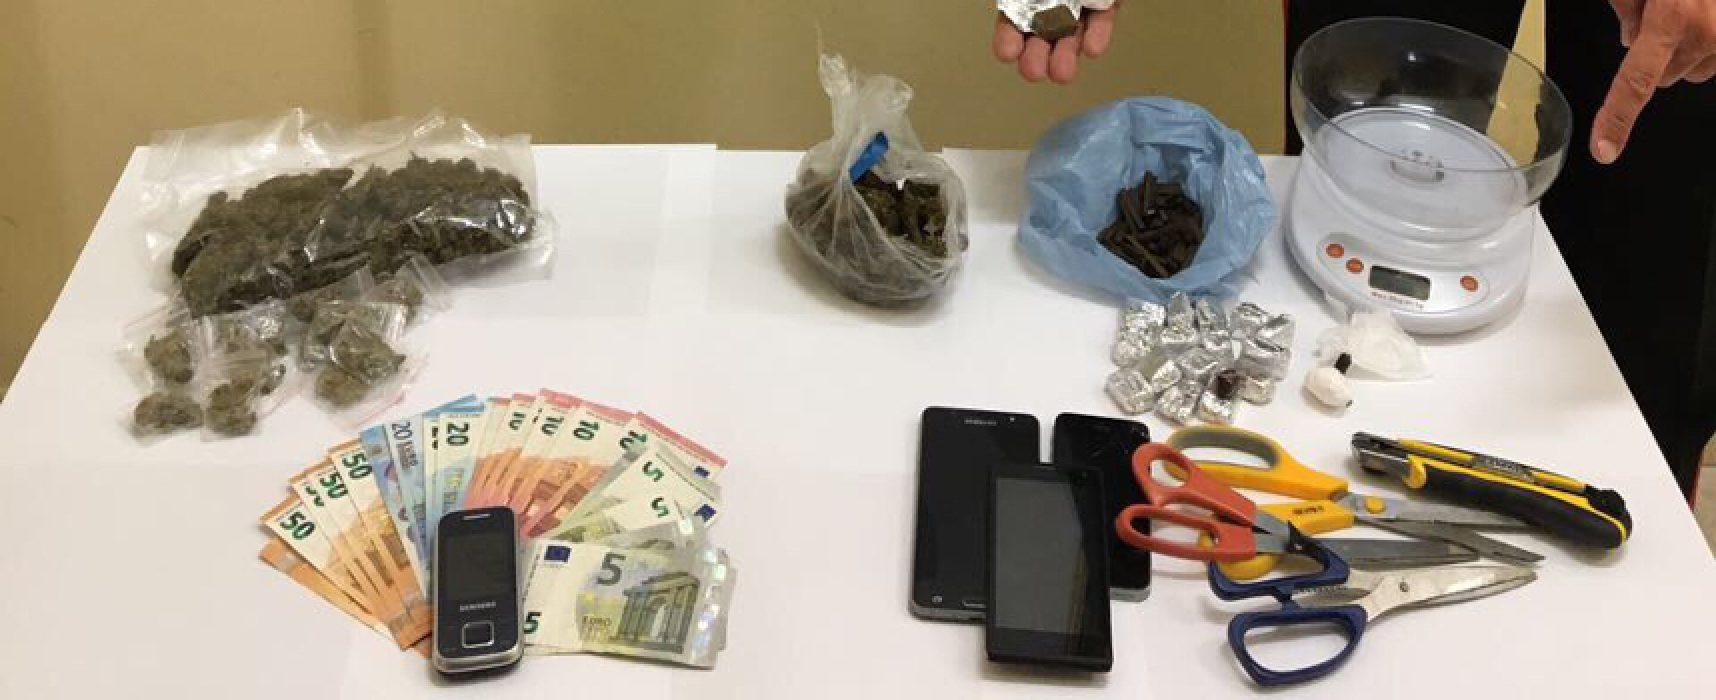 Blitz antidroga all'alba a Bisceglie, arrestate tre persone